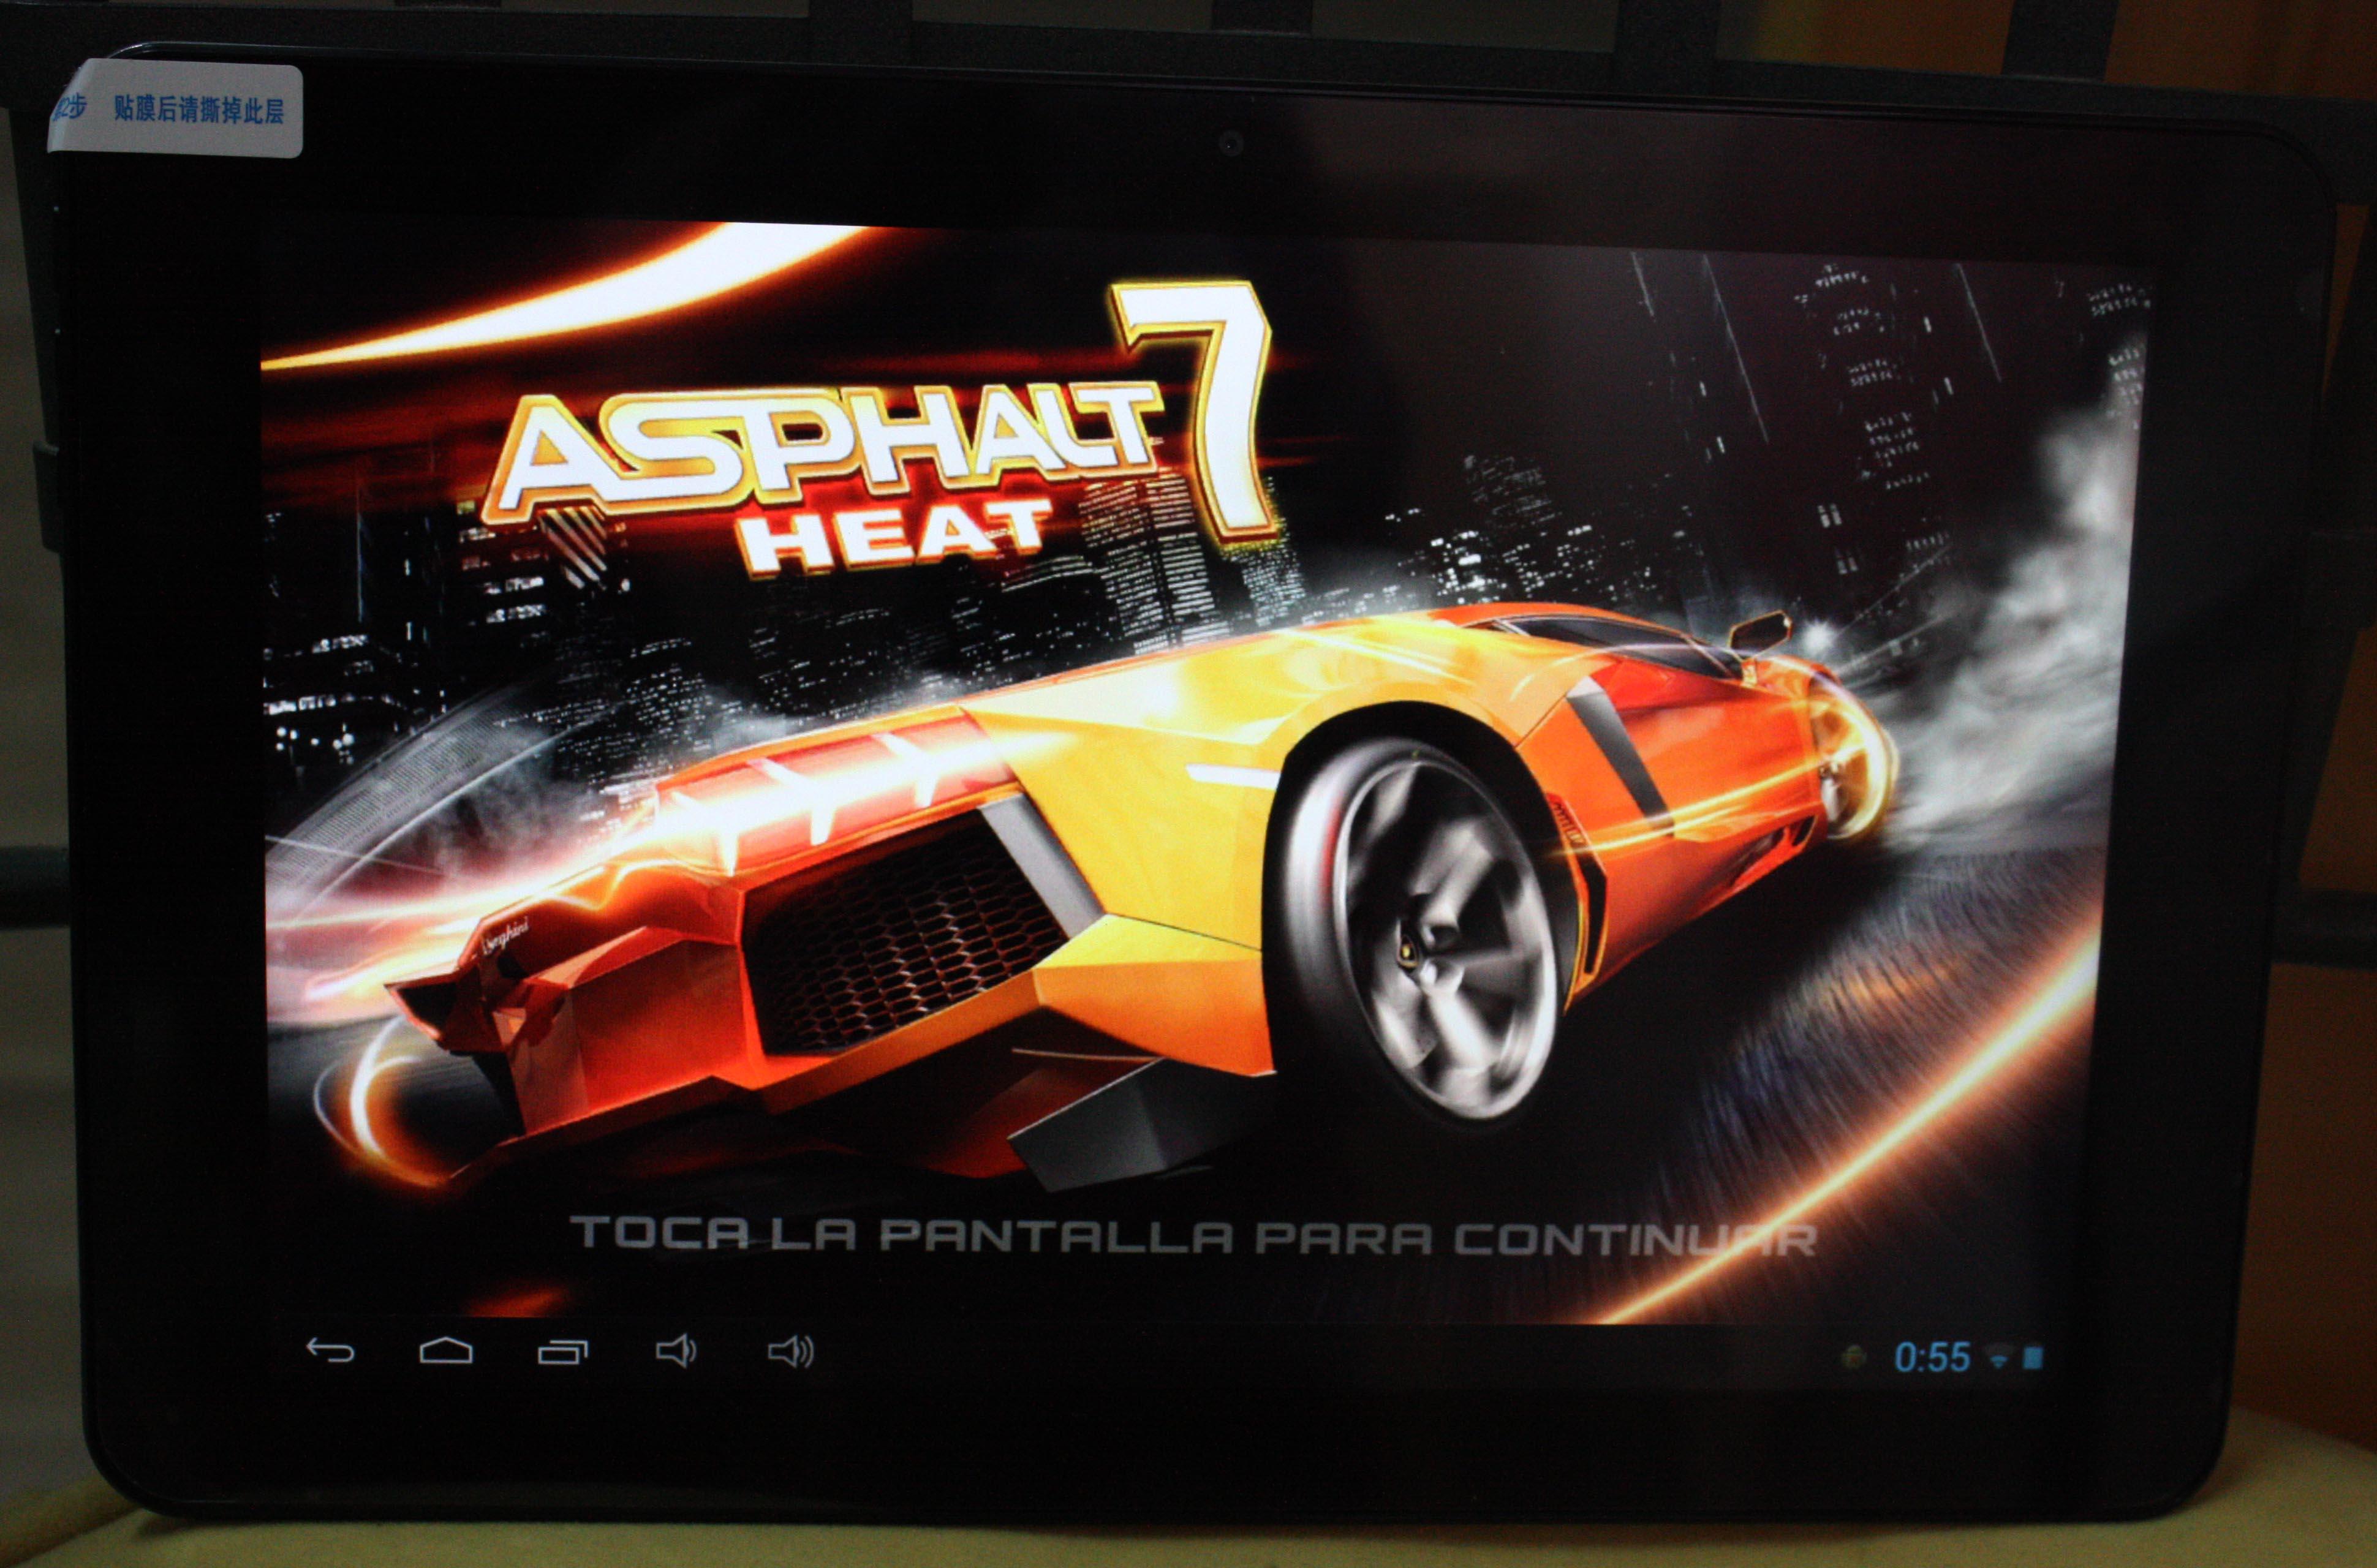 Cube U30GT2 asphalt 7 heat